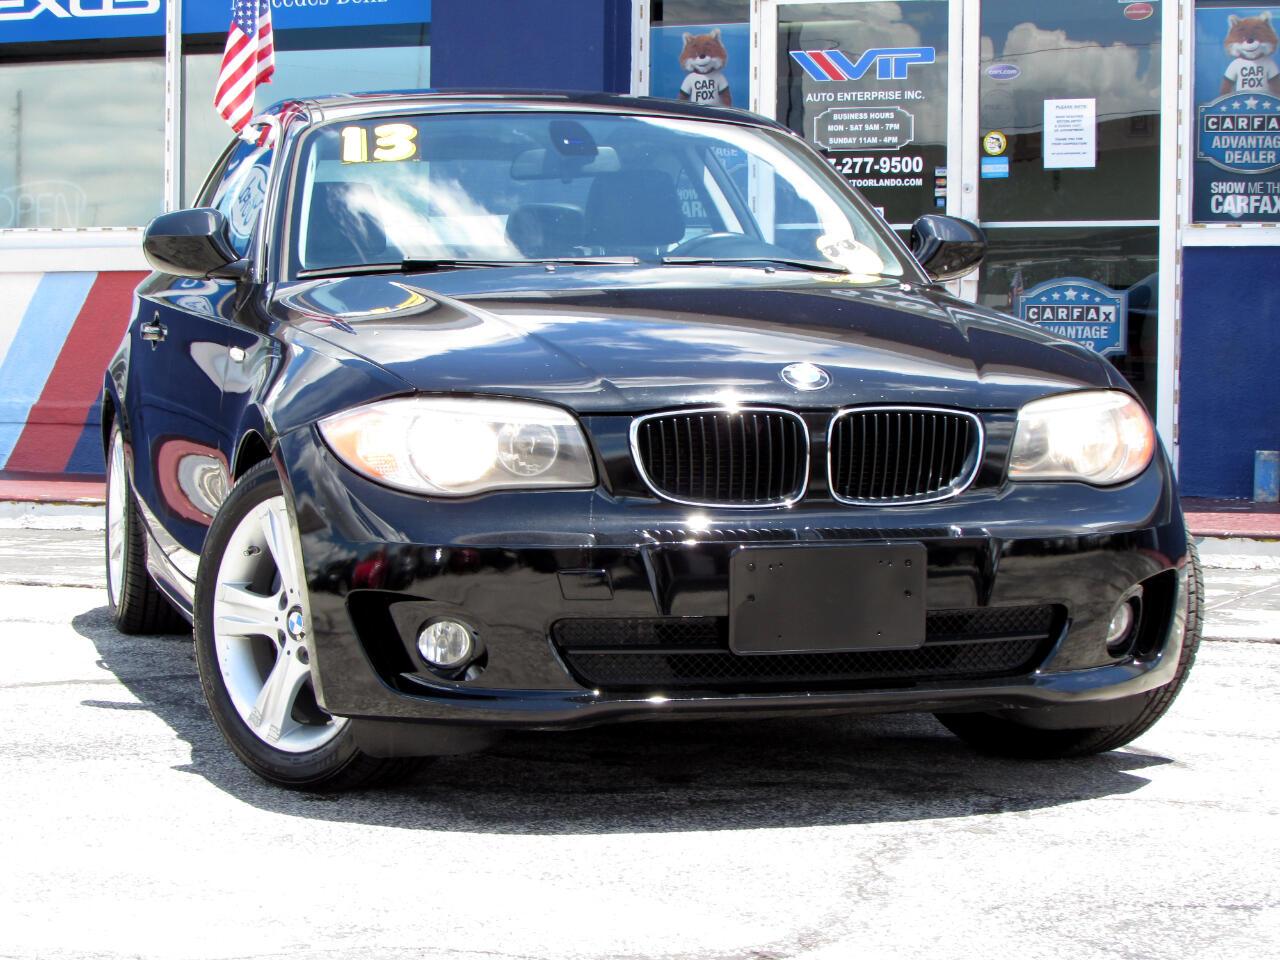 BMW 1 Series 2dr Cpe 128i SULEV 2013